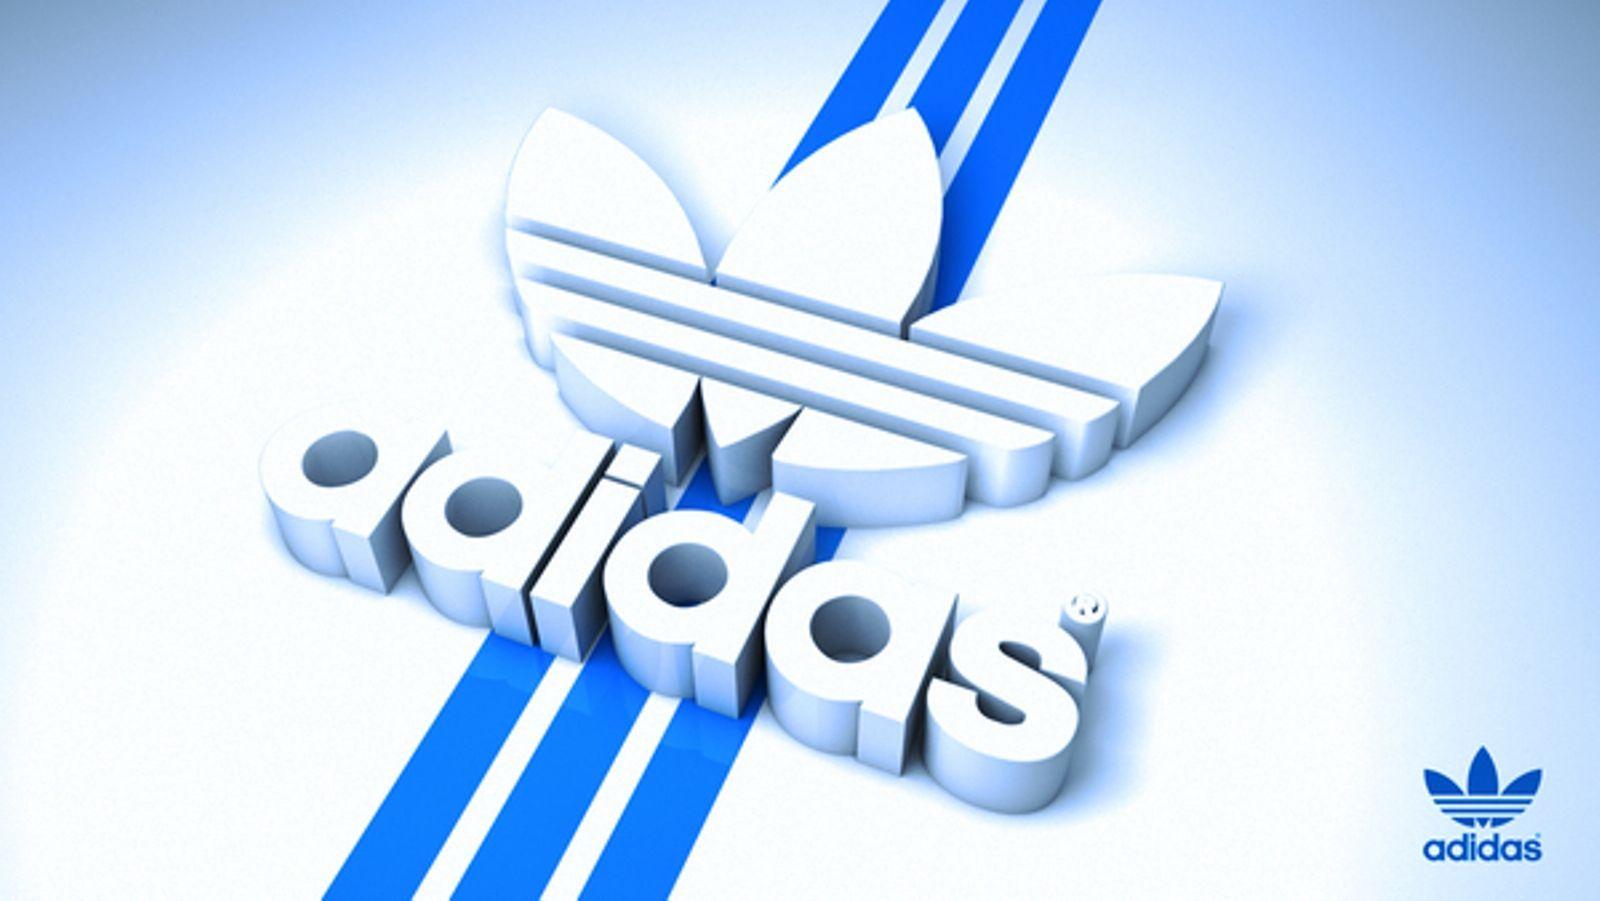 iphone adidas wallpaper, imagenes de adidas